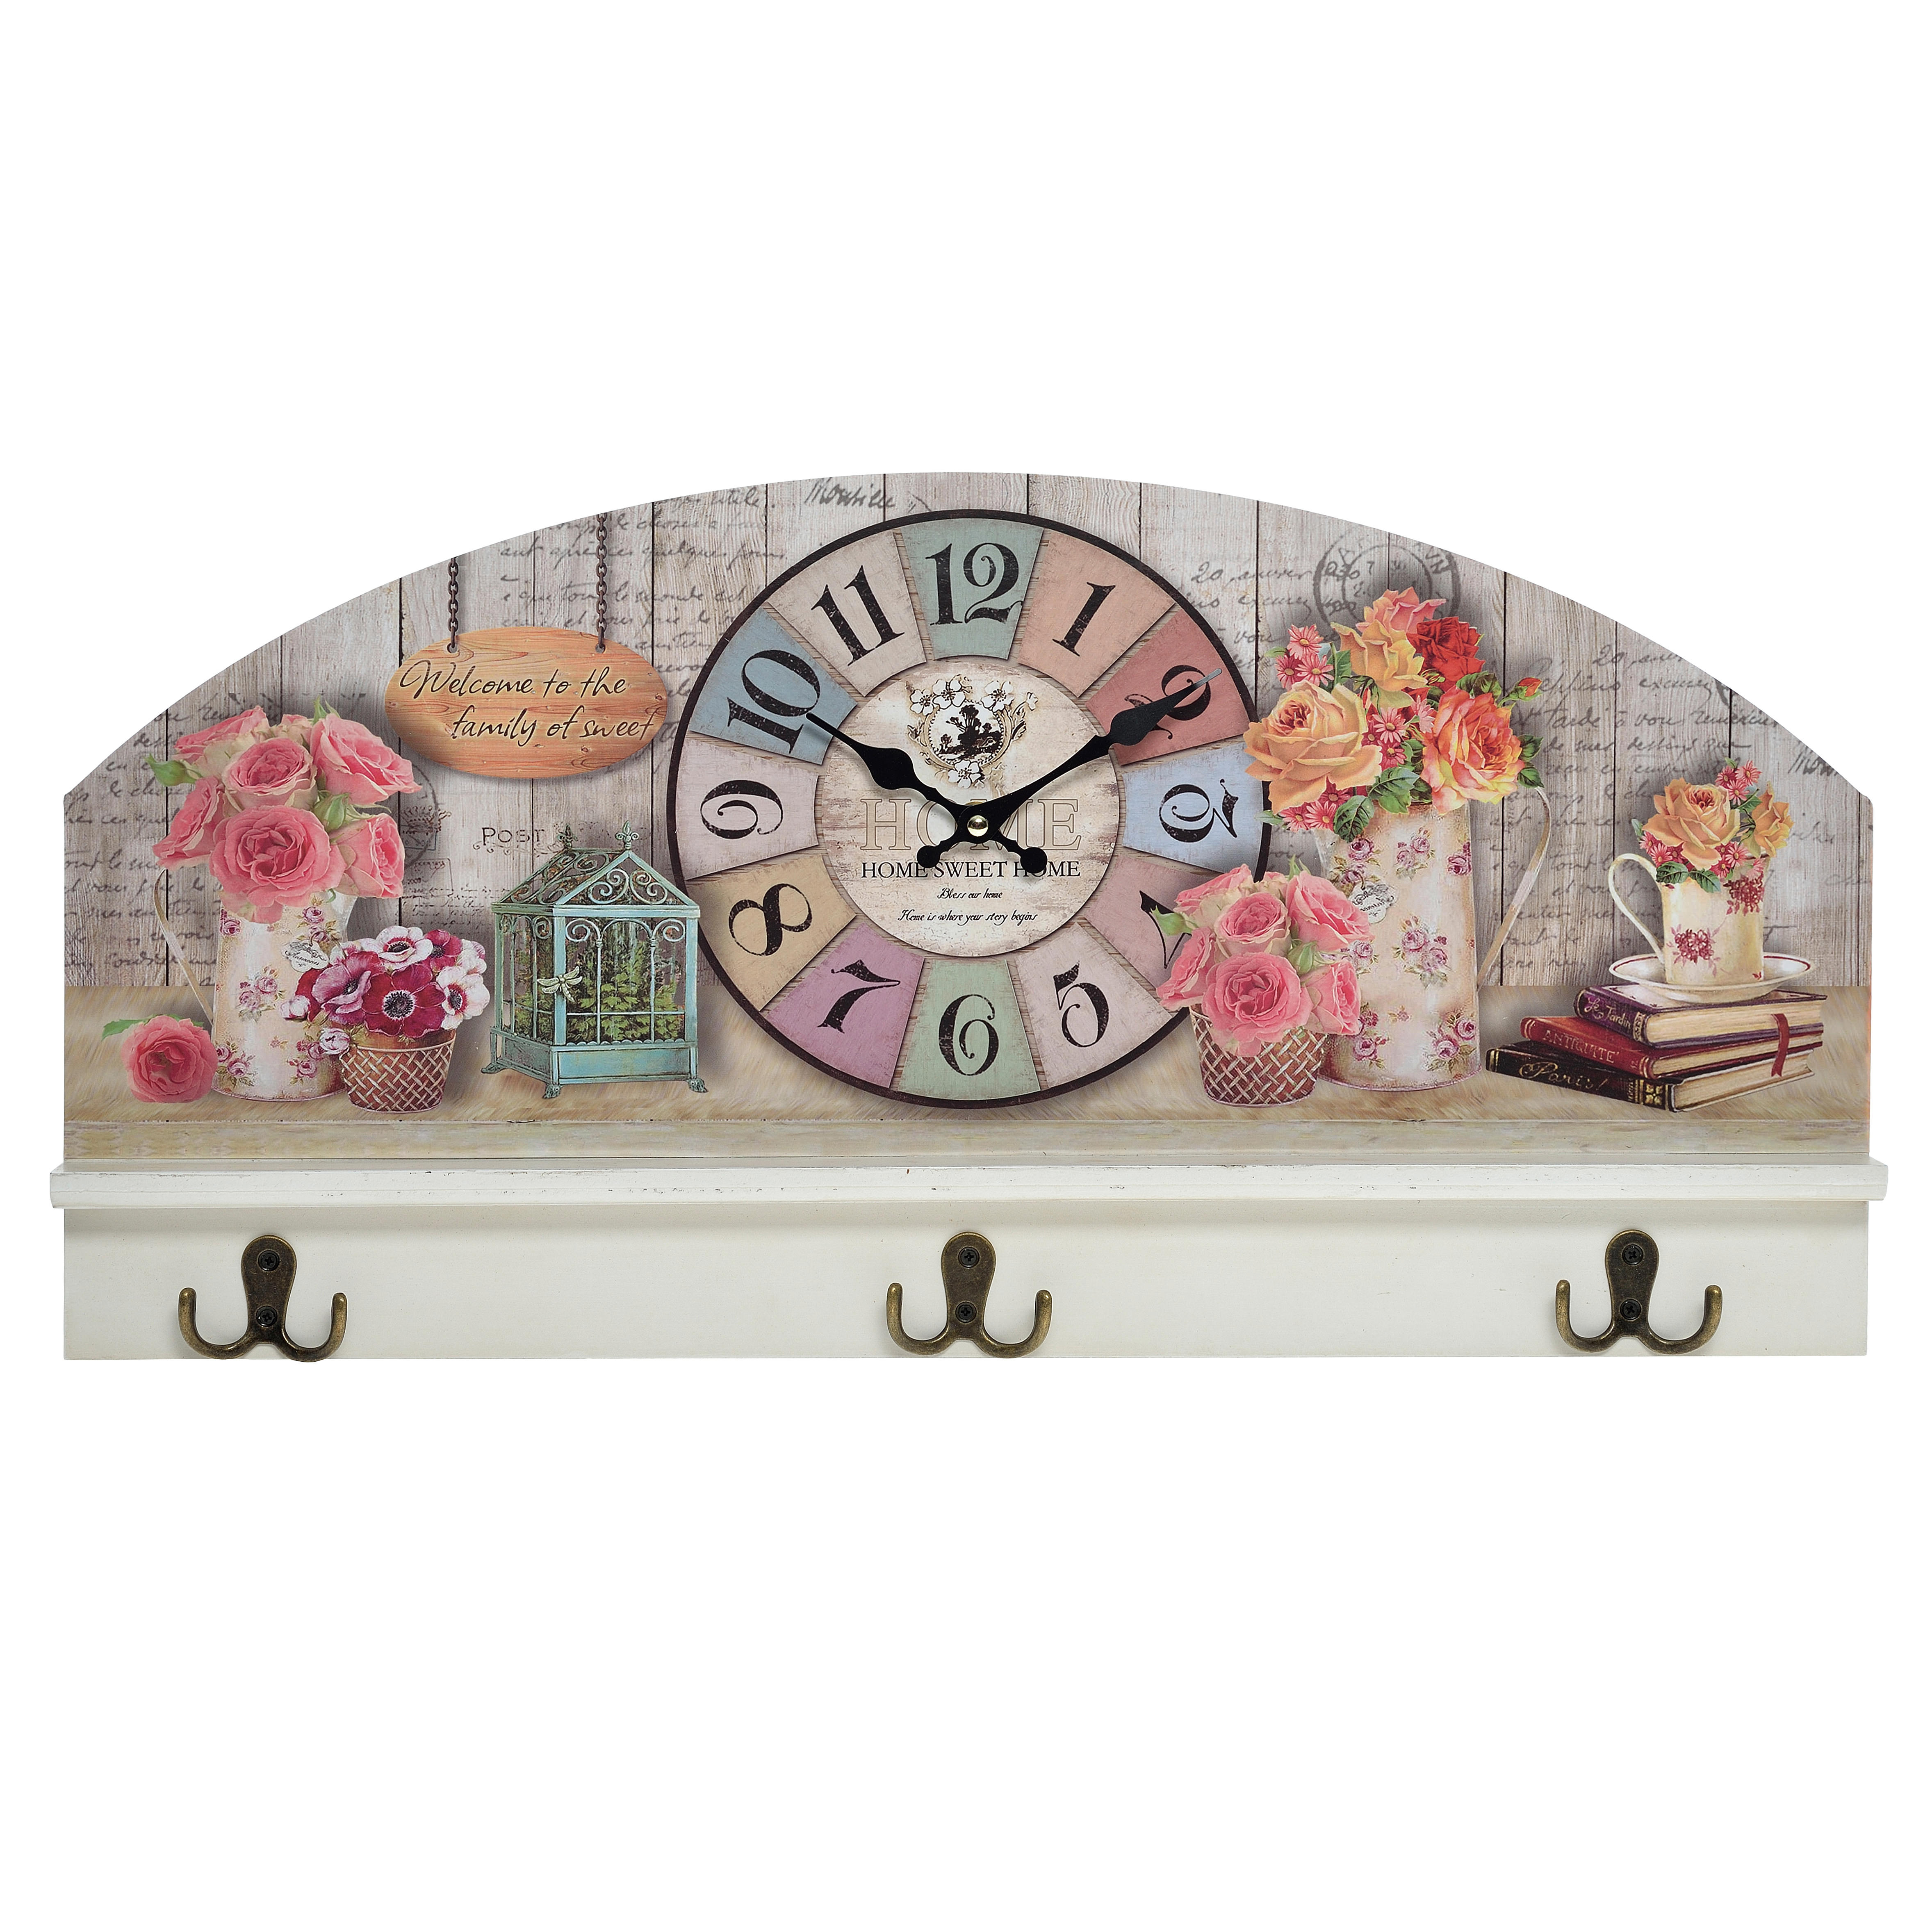 Часы настенные с вешалкой RosmaryНастенные часы<br>&amp;lt;span style=&amp;quot;font-size: 14px;&amp;quot;&amp;gt;Кварцевый механизм.&amp;lt;/span&amp;gt;<br><br>Material: Дерево<br>Width см: 59<br>Depth см: 6<br>Height см: 29